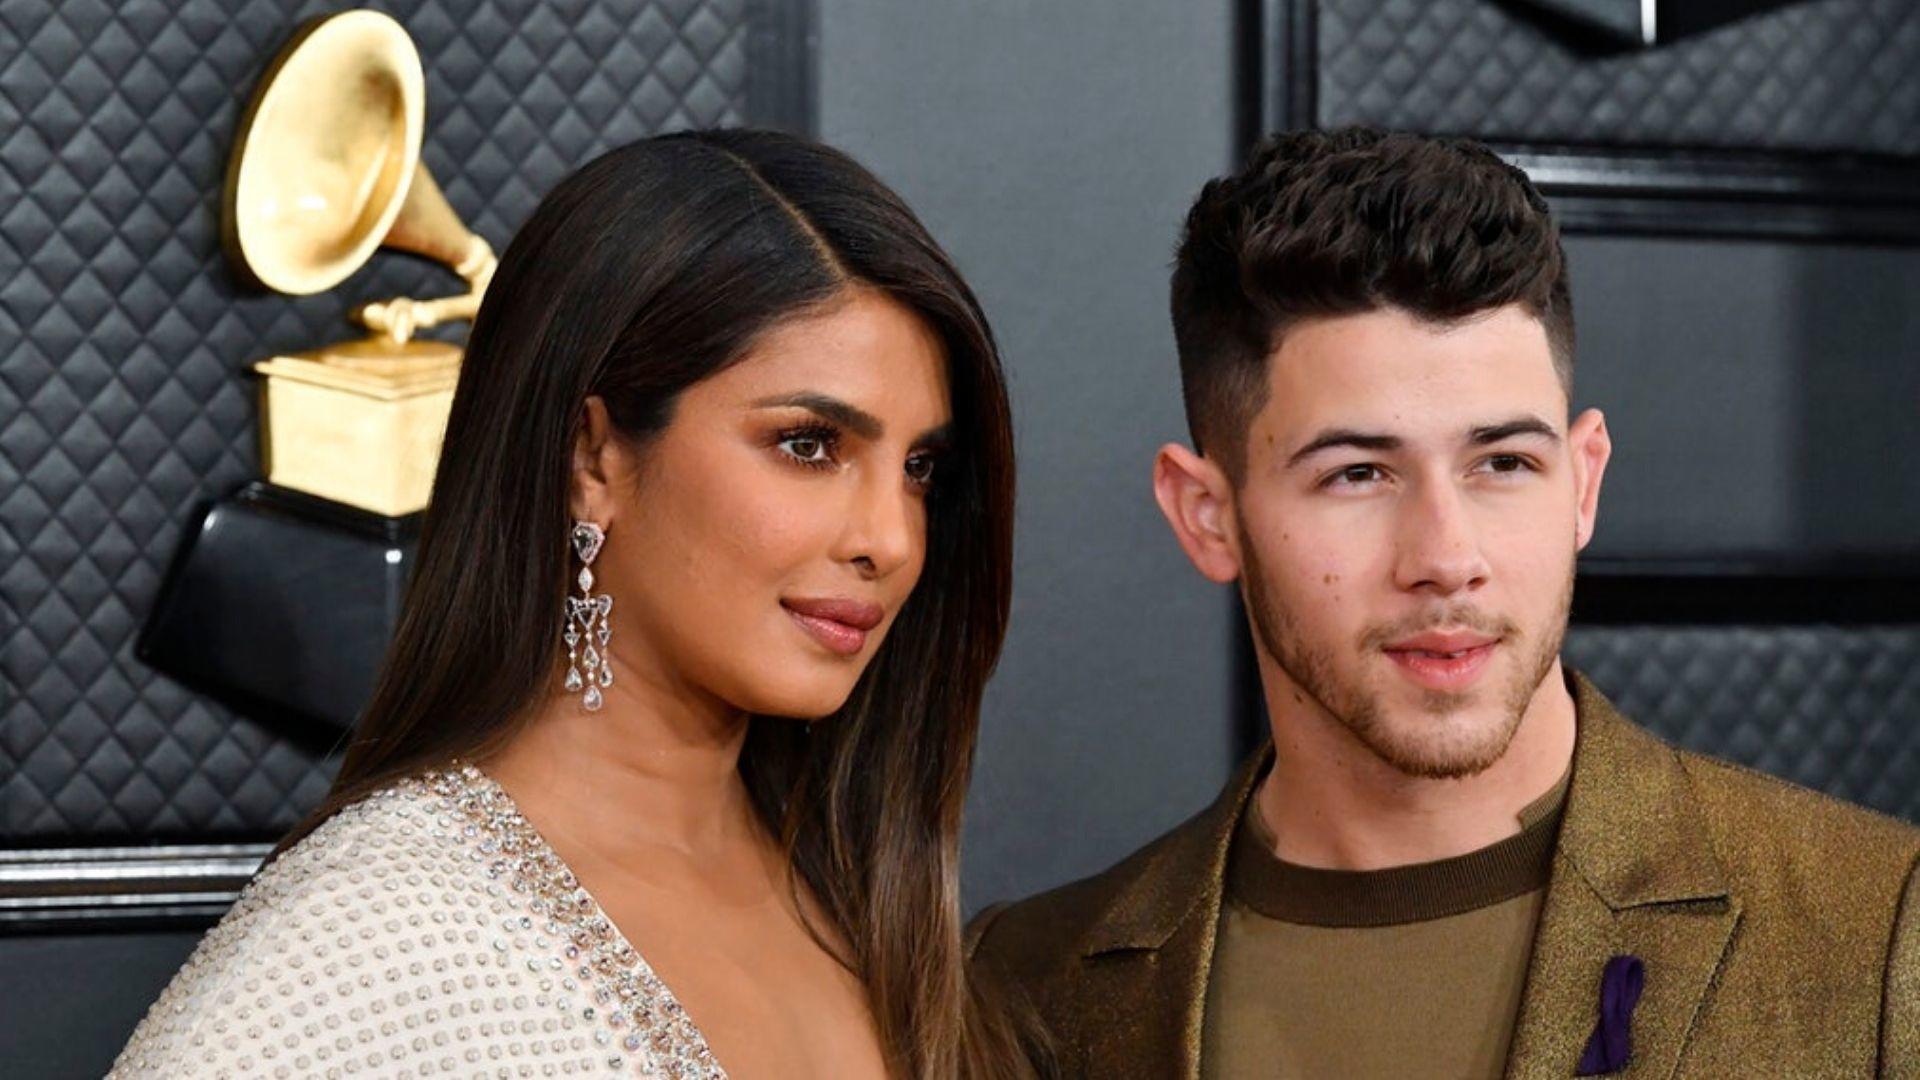 Priyanka Chopra Paid Tribute To Kobe Bryant On The 2020 Grammy Awards Red Carpet In The Sweetest Way